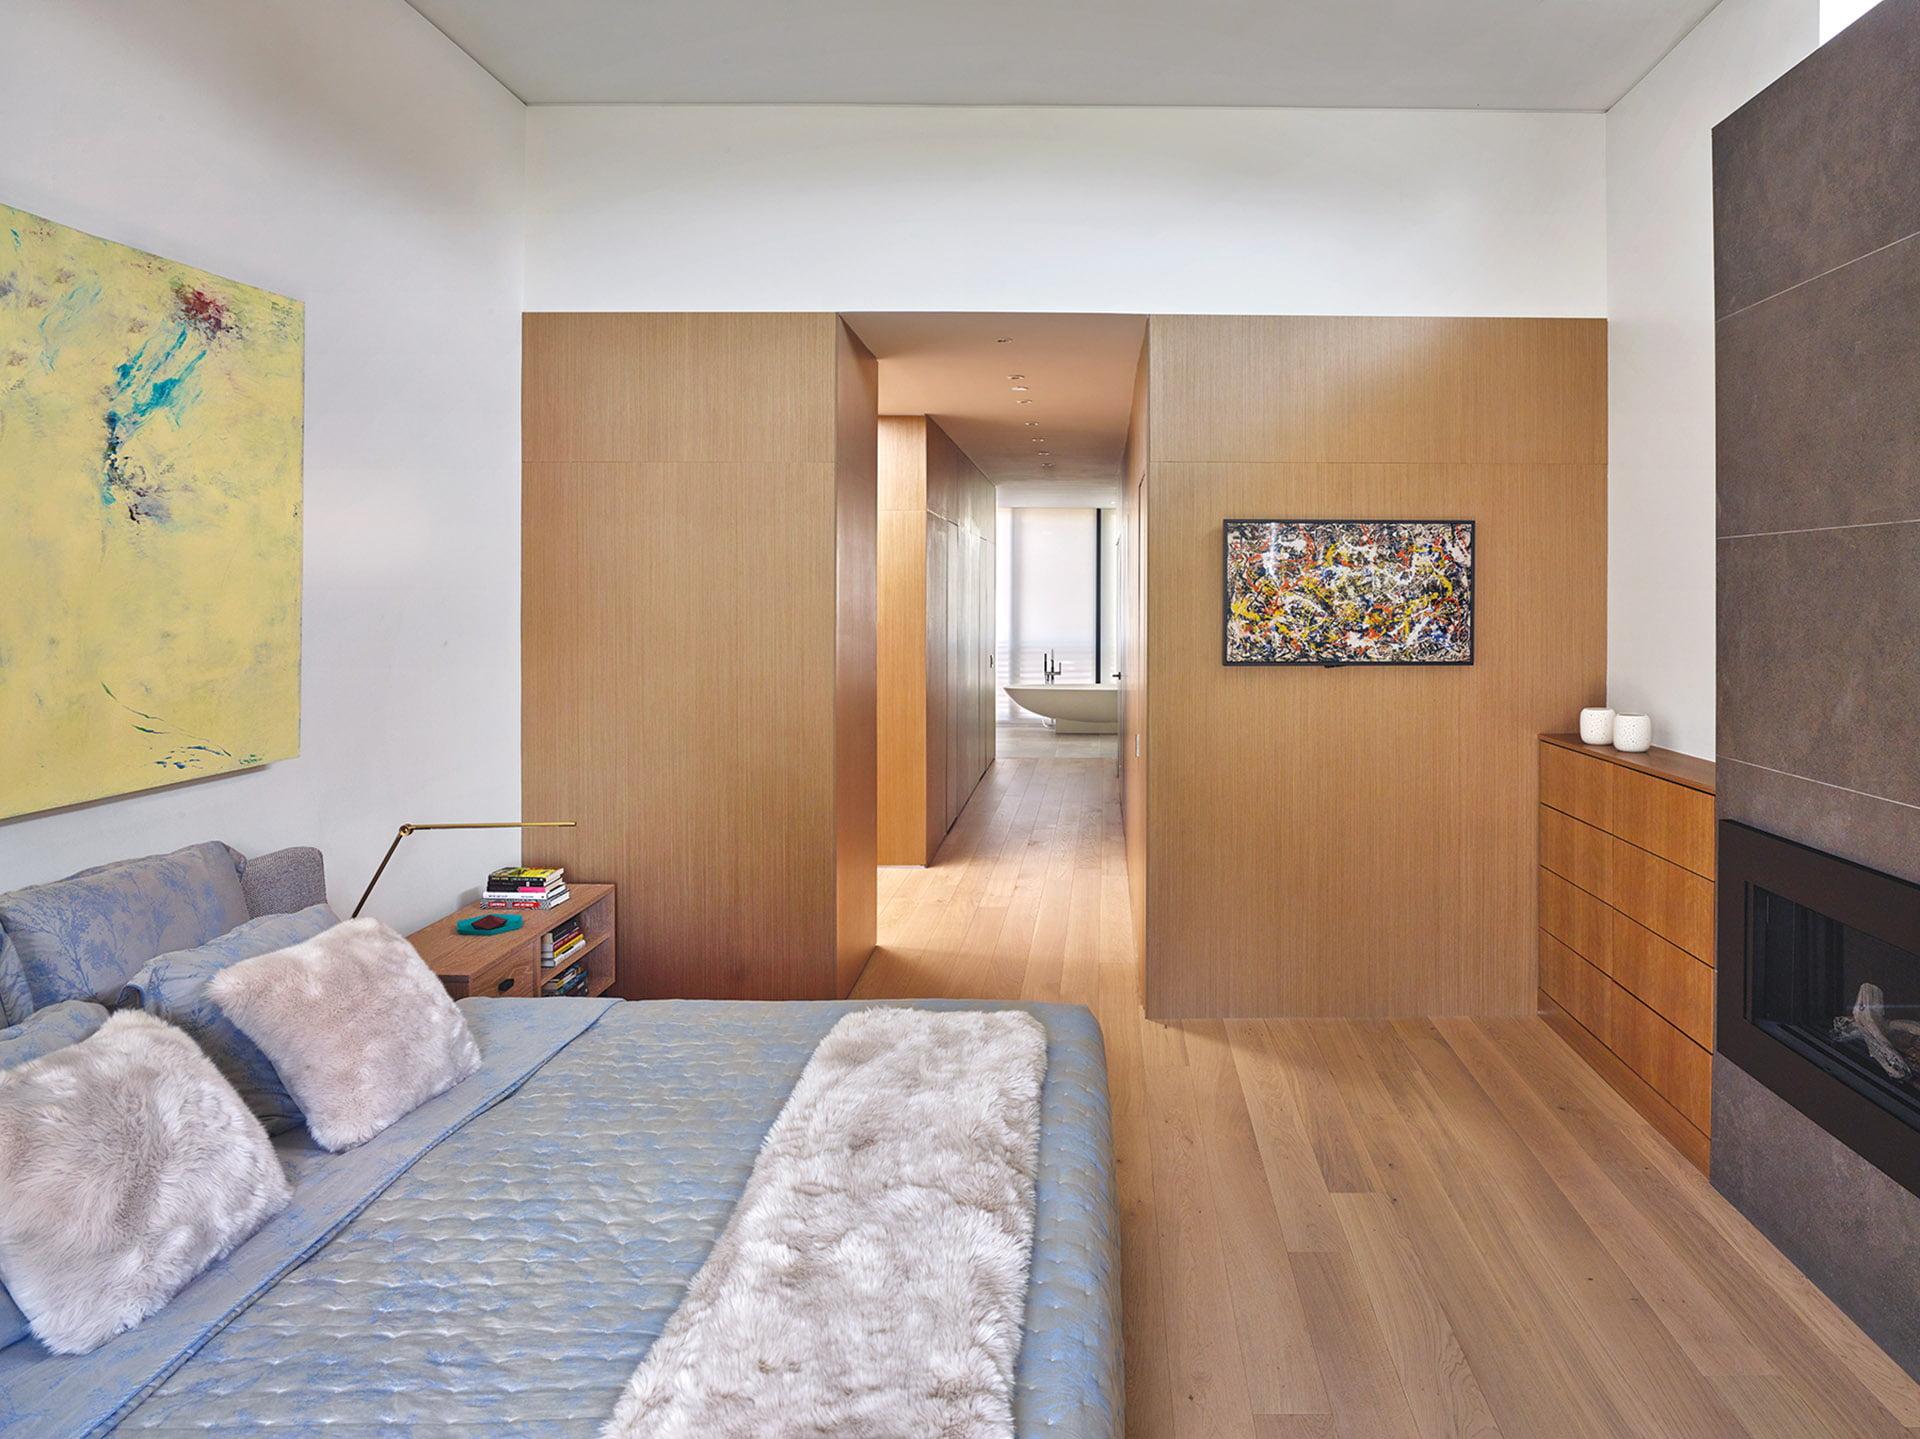 European white oak paneling bedroom walls, clerestory windows.